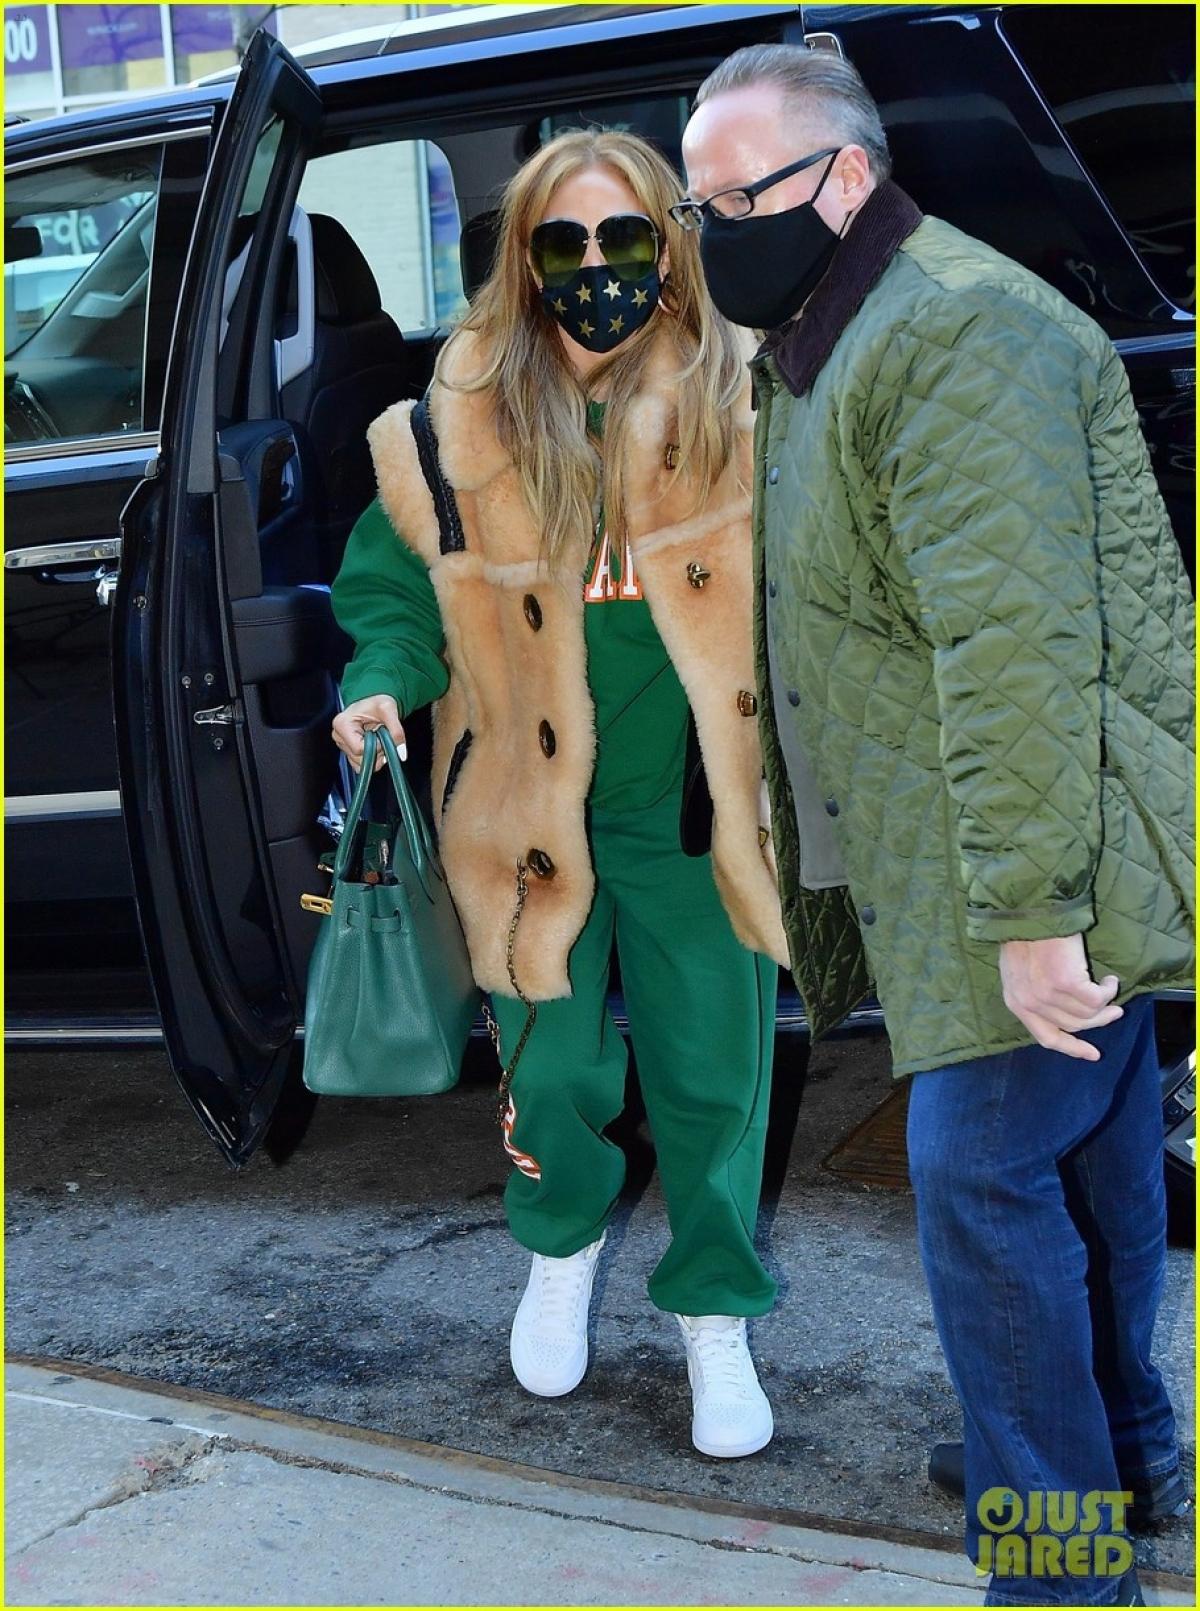 Jennifer Lopez vừa trở về New York sau kỳ nghỉ lễ Giáng sinh ở Miami.